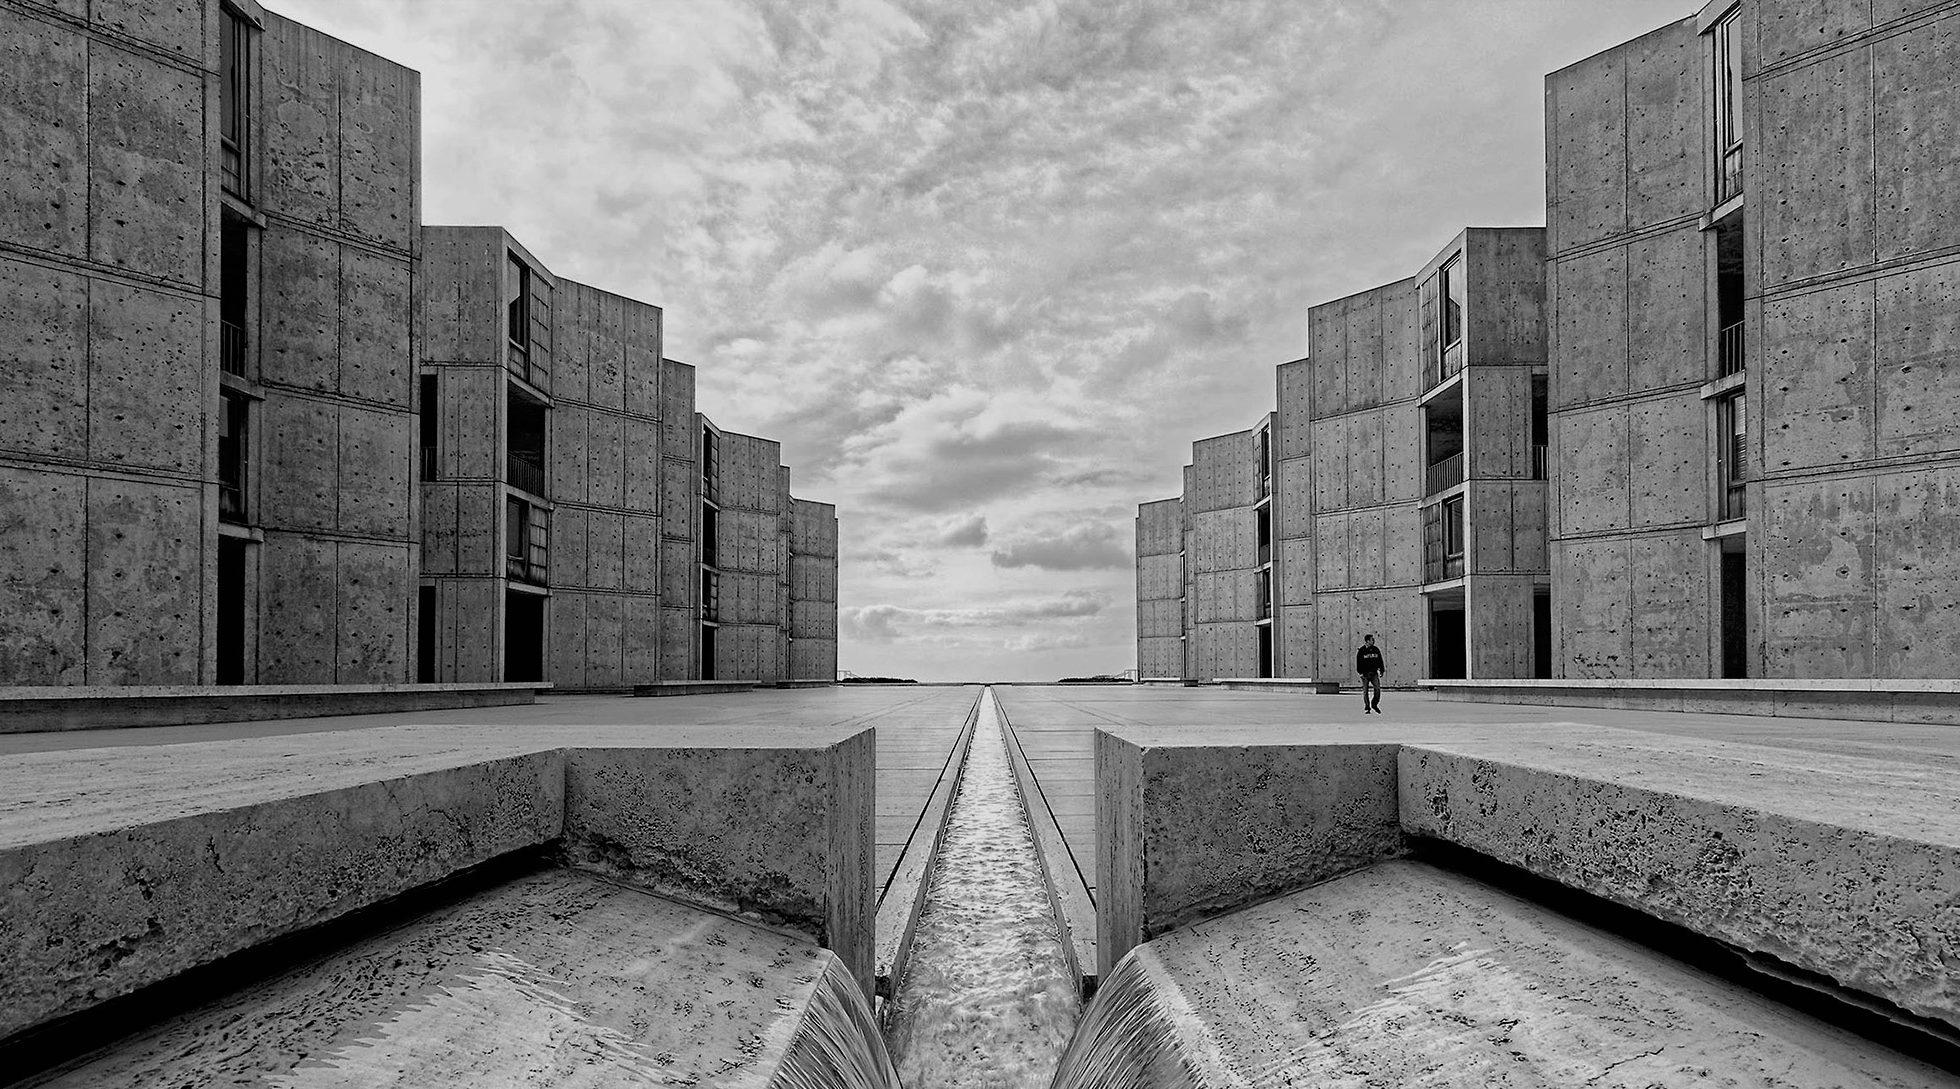 Architectural photography of the Salk Institute in La Jolla, CA Architect: Louis Kahn Photo © Paul Dingman 2009